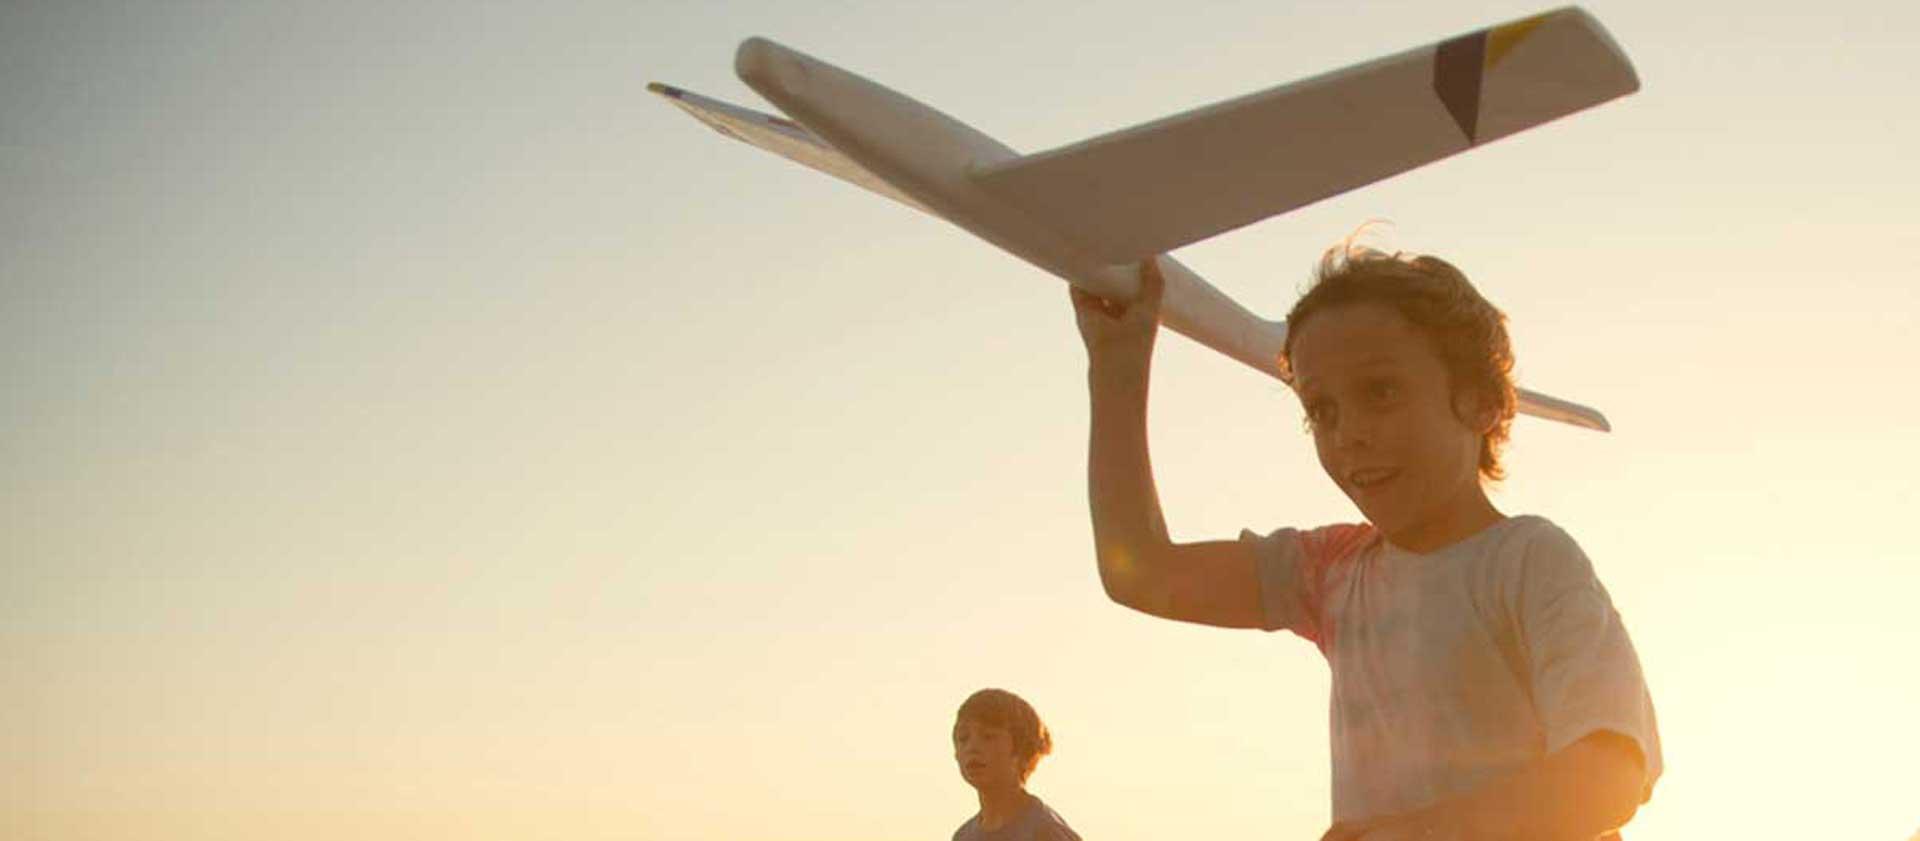 boy on beach with toy plane